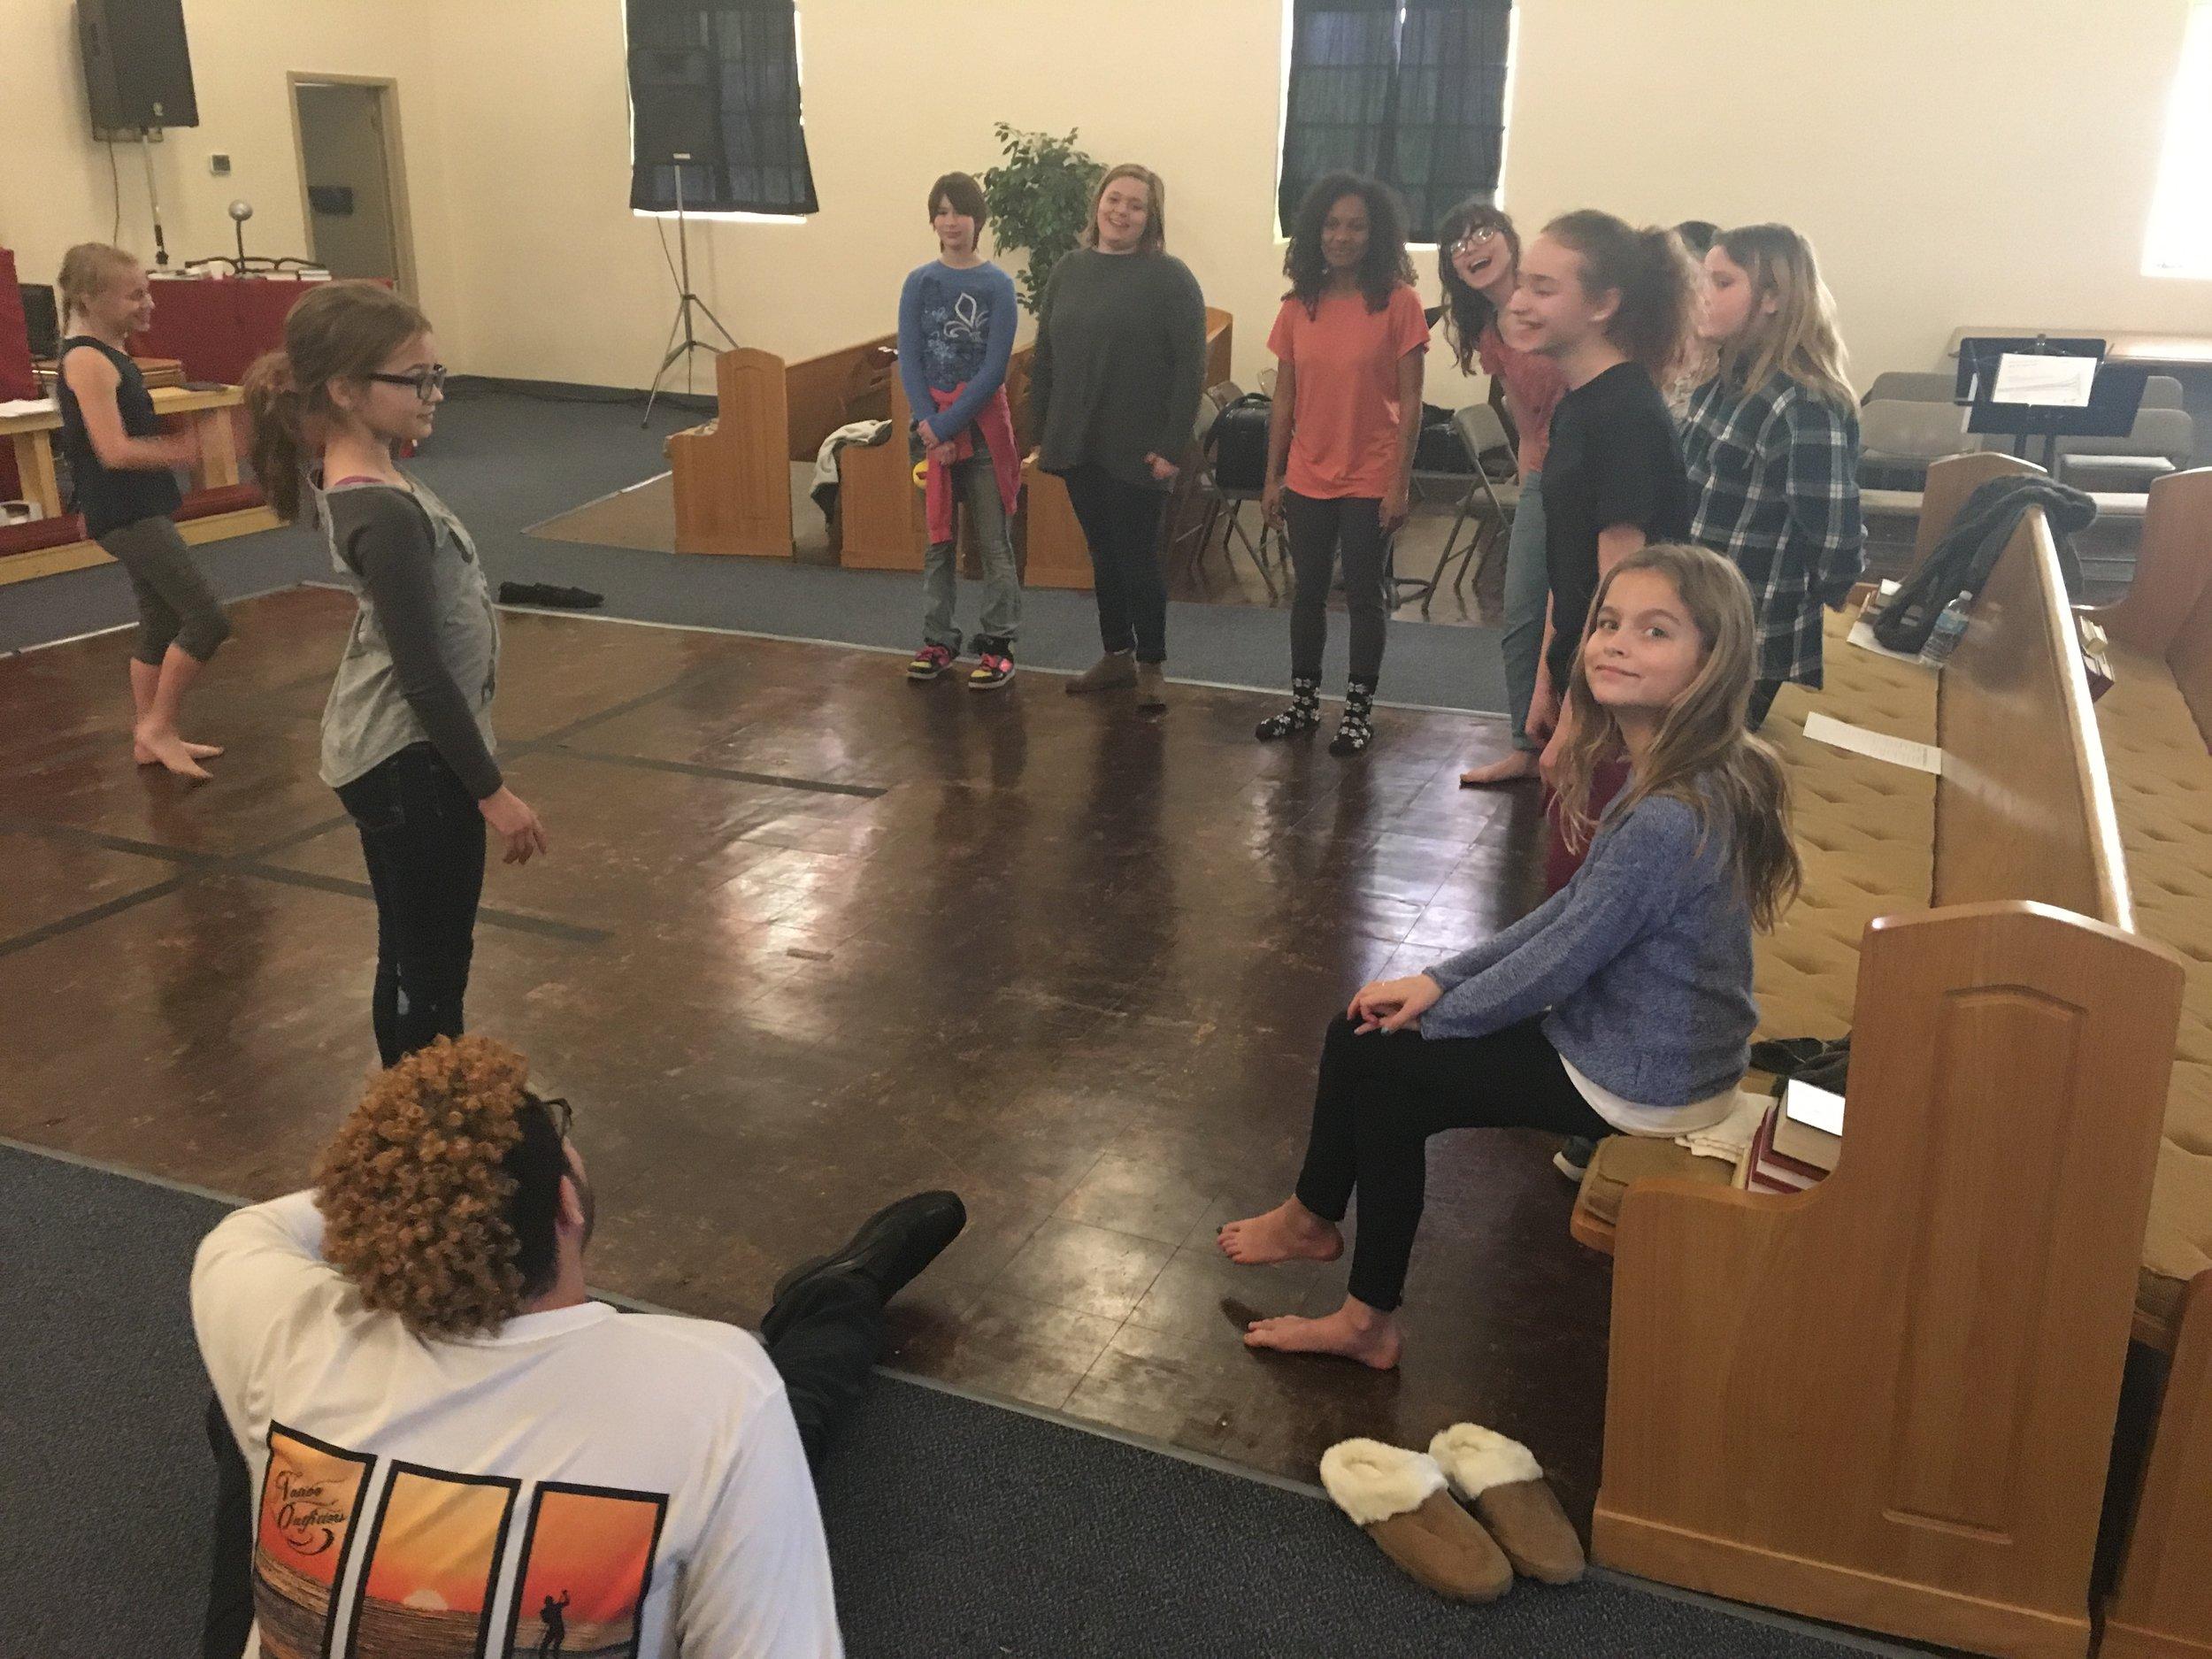 Tamber Walls teaching dance!